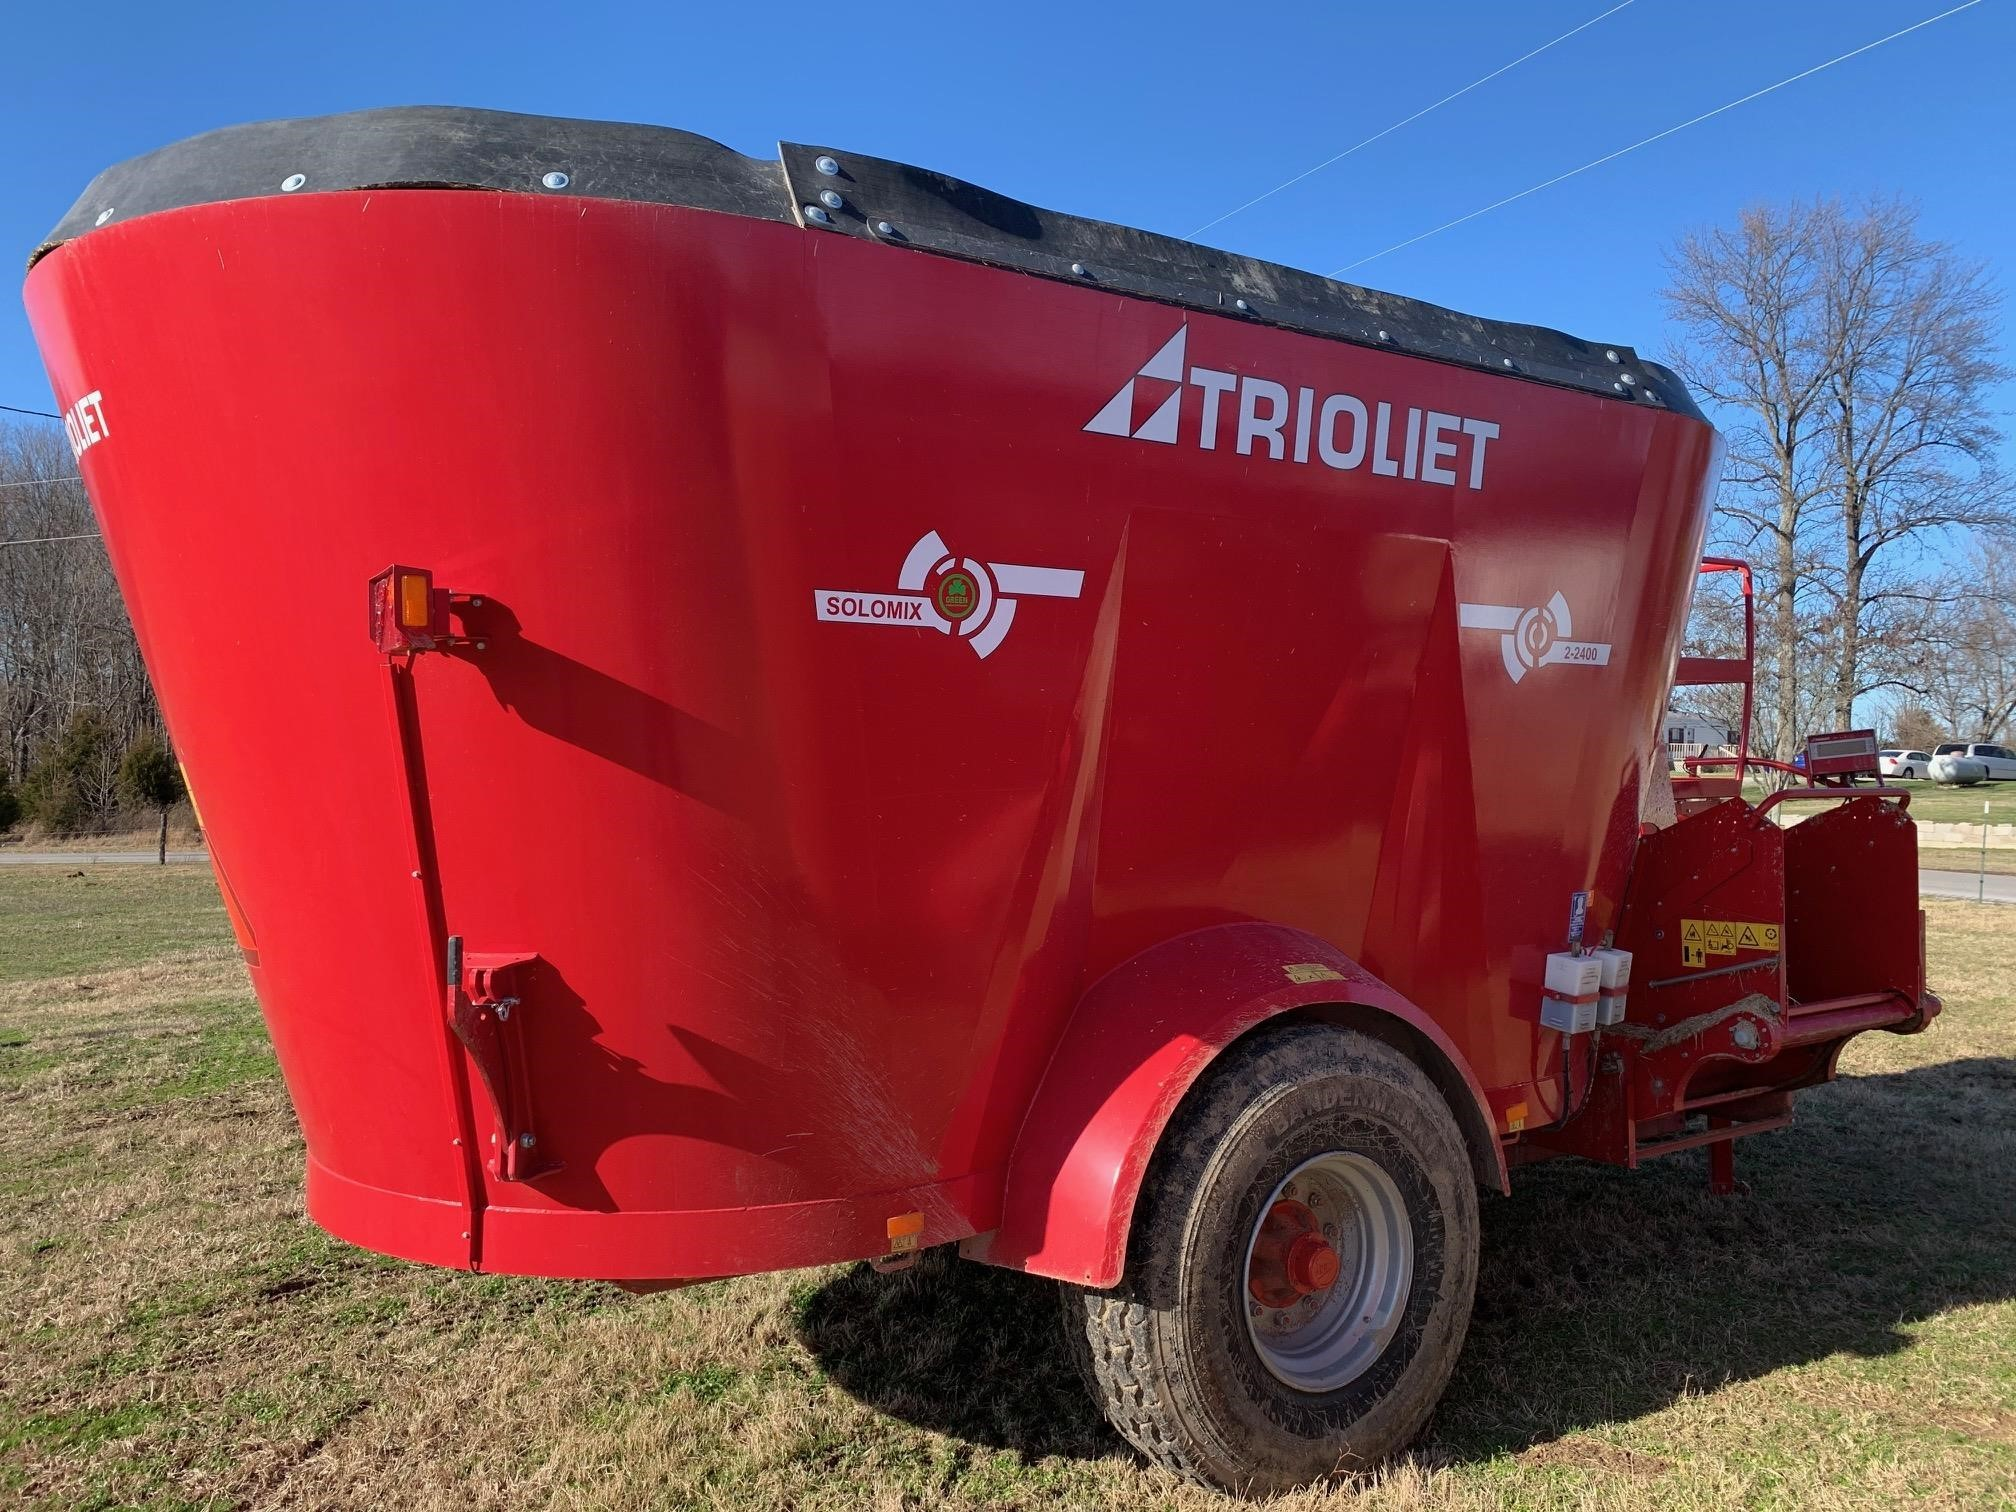 2021 Trioliet SOLOMIX 2400 Feed Wagon